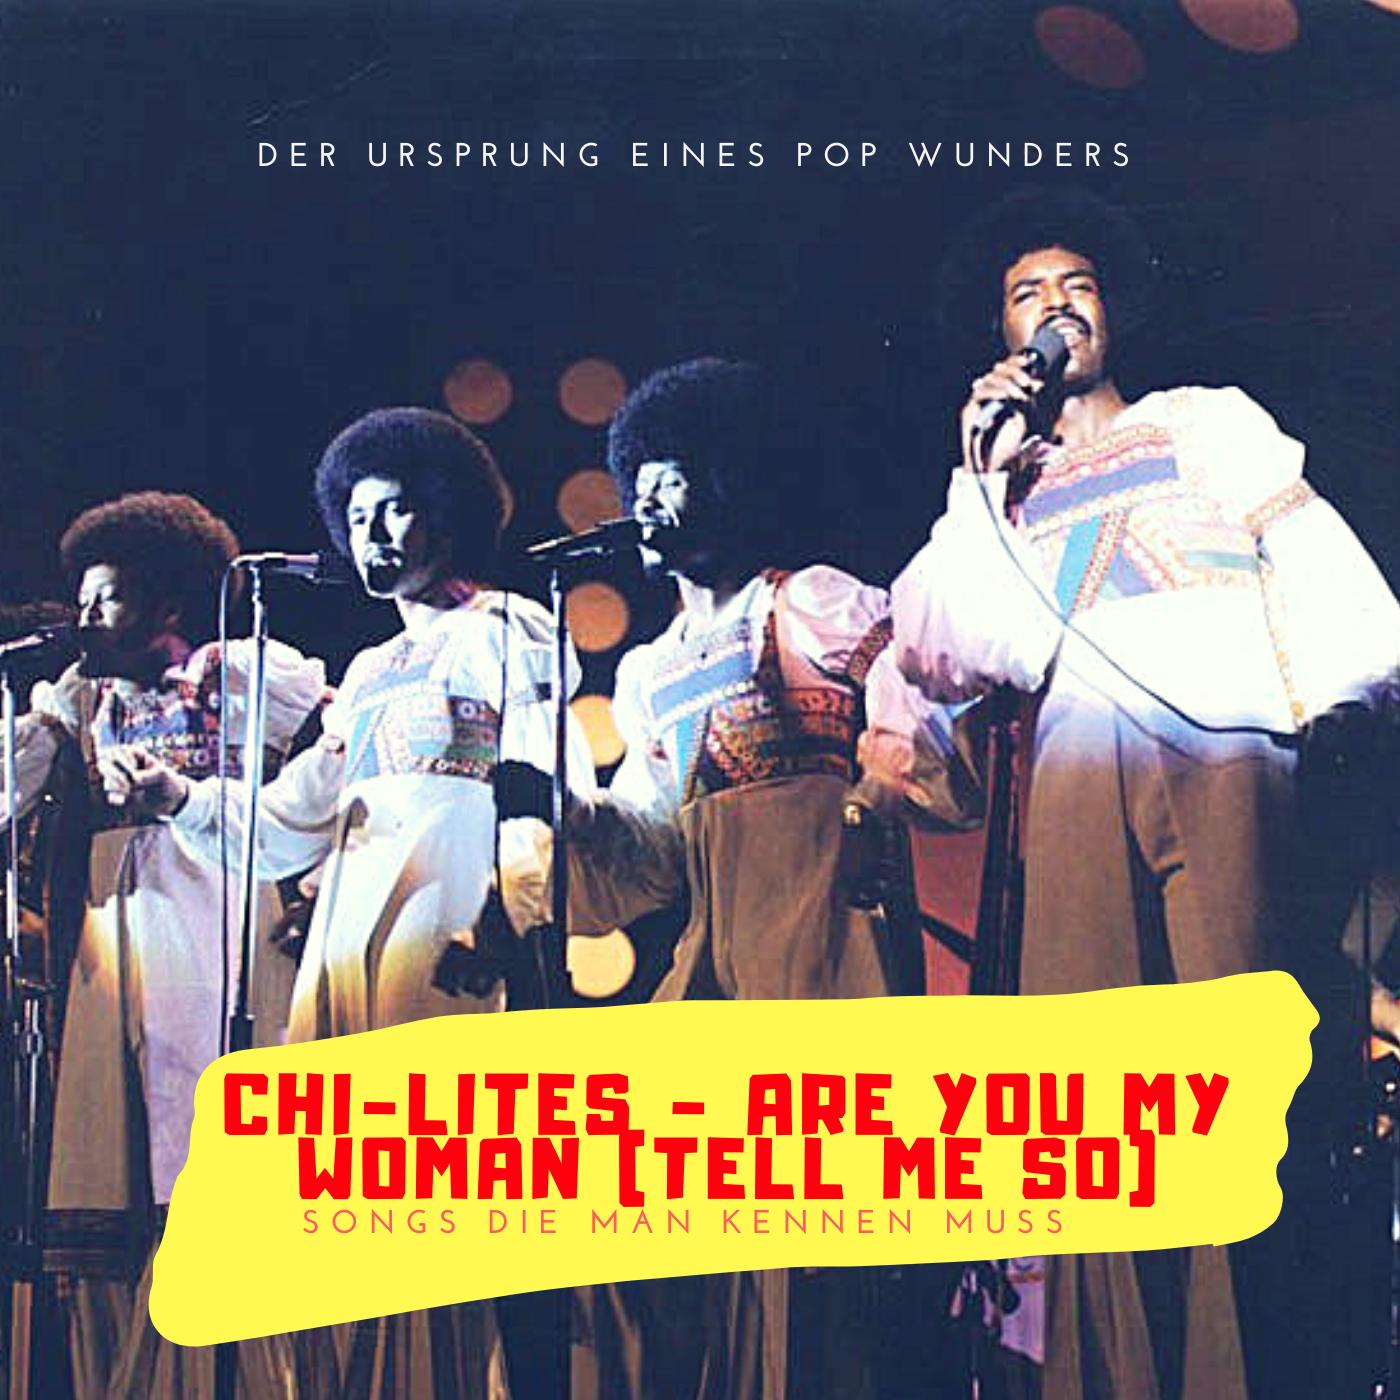 Der Ursprung eines Pop Wunders | Chi-Lites - Are You My Woman (Tell Me So) | Songs die man kennen muss